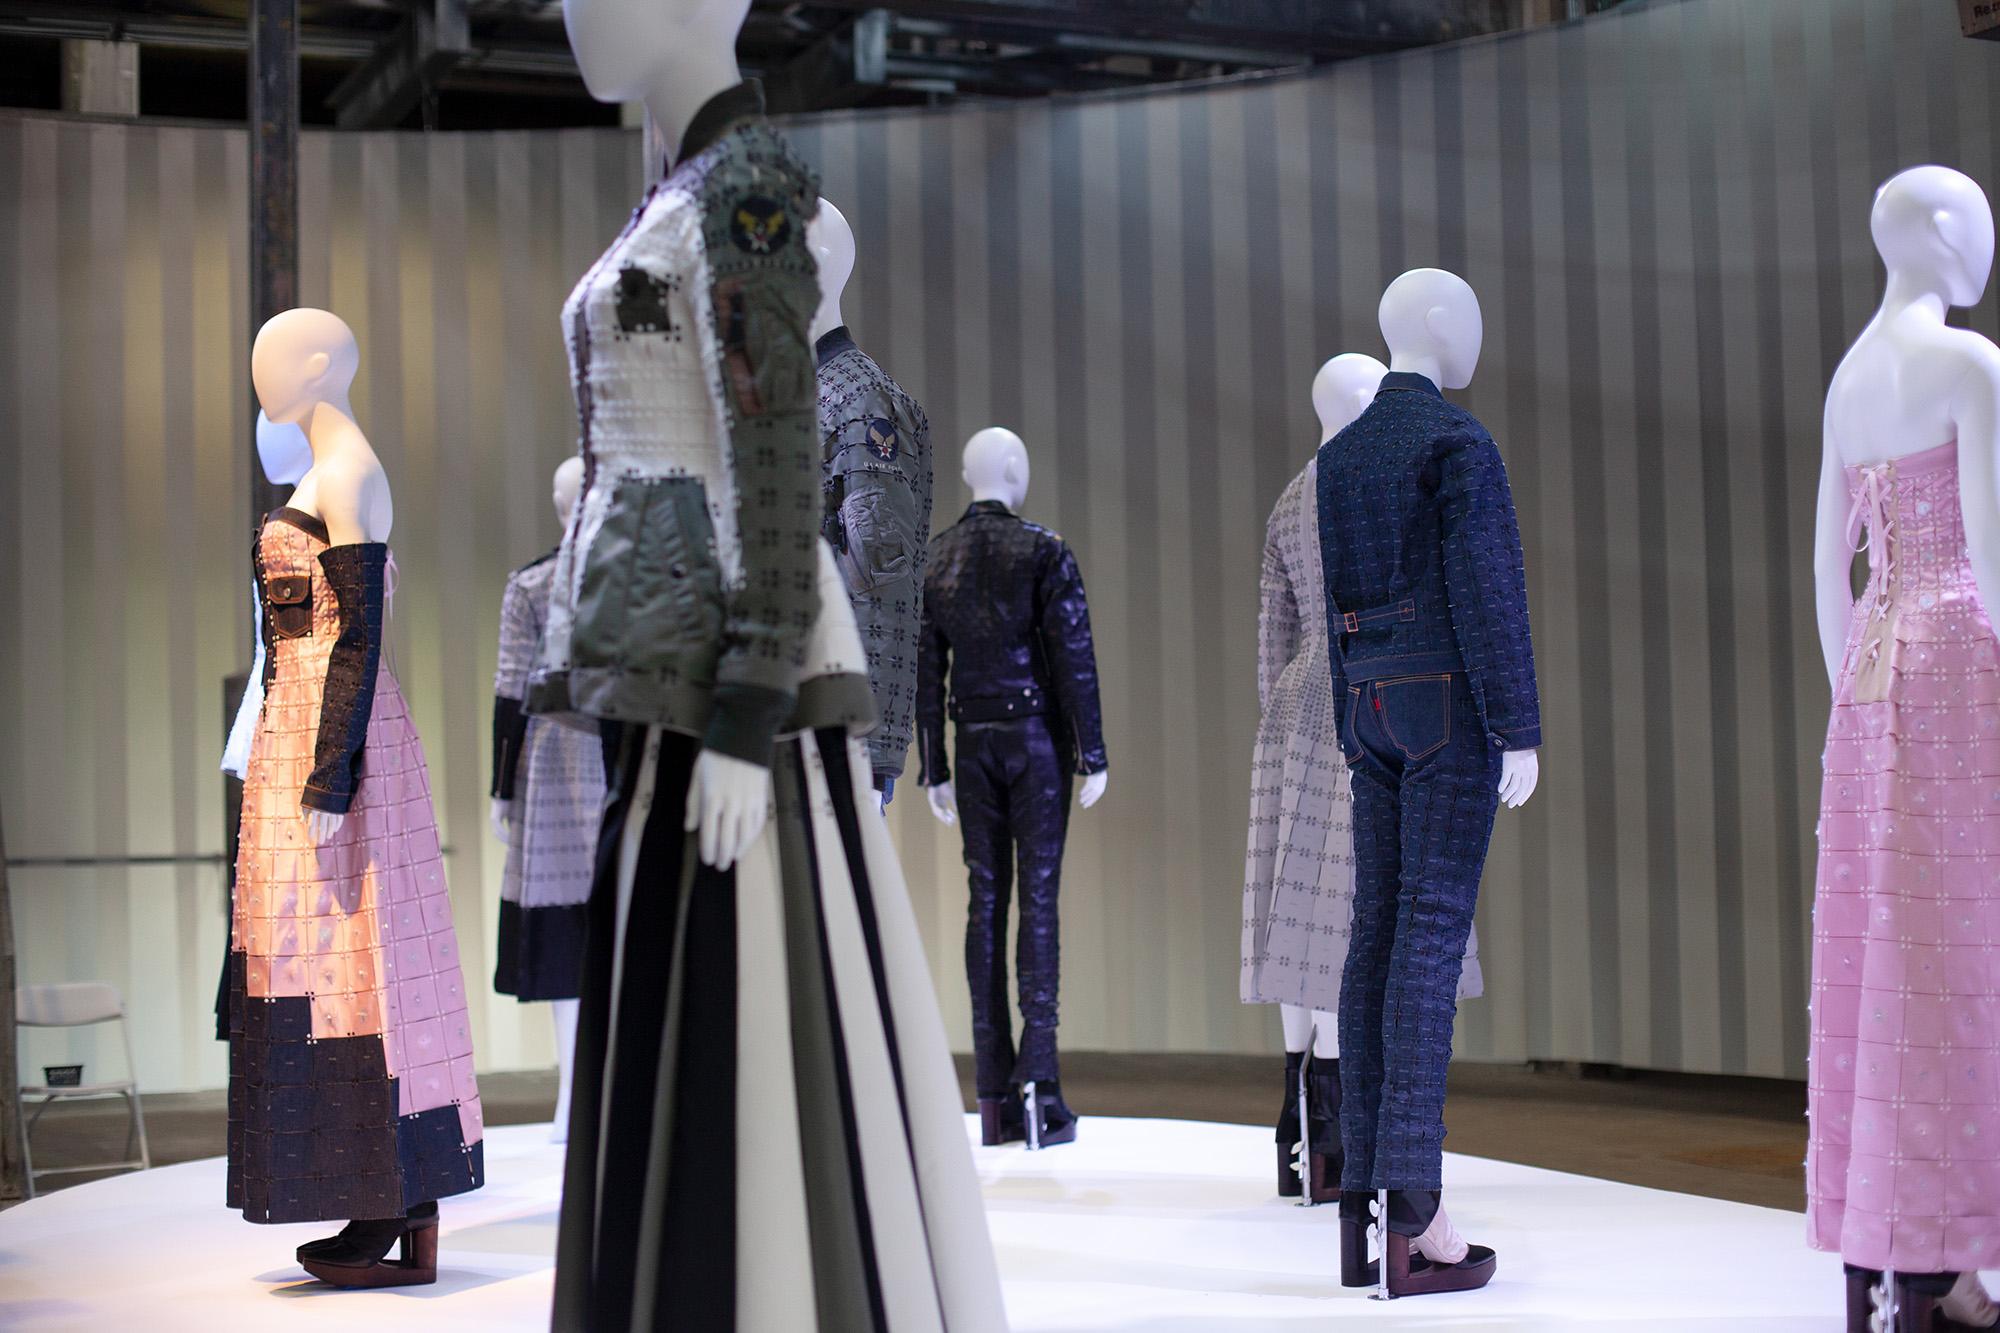 Design pieces by Yuima Nakazato.